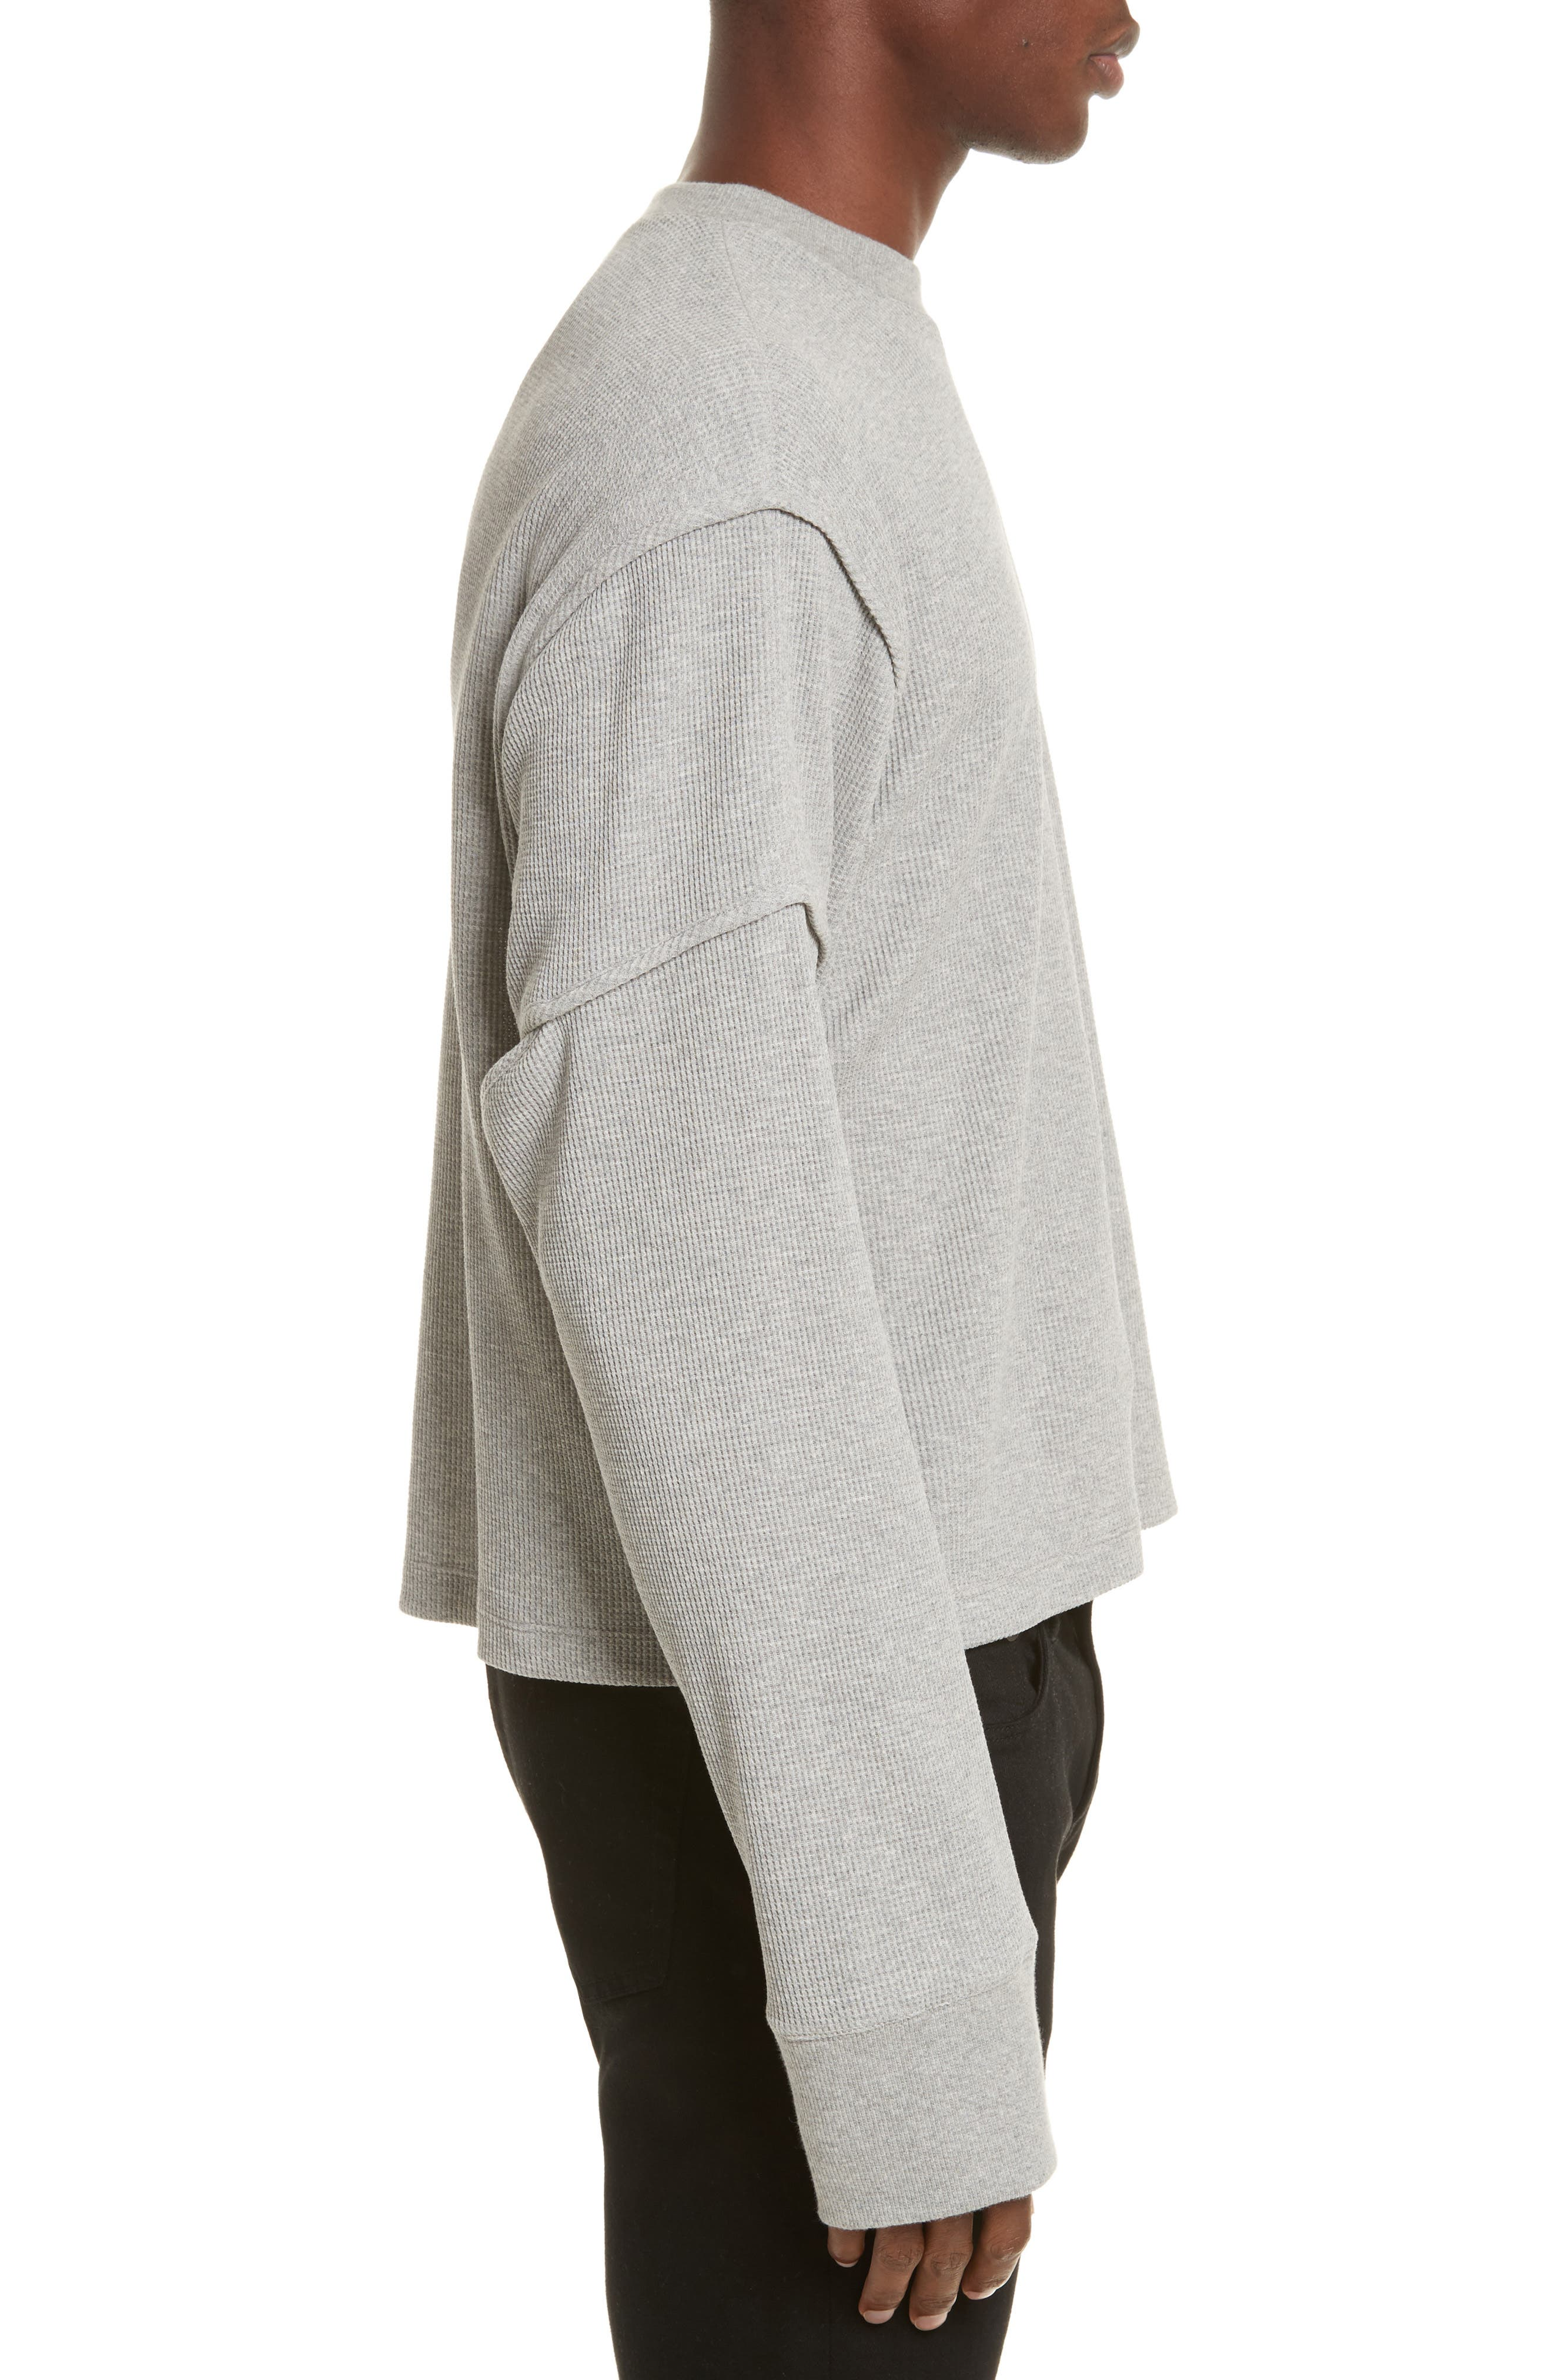 Military Panel Sleeve Thermal Shirt,                             Alternate thumbnail 3, color,                             Grey Melange